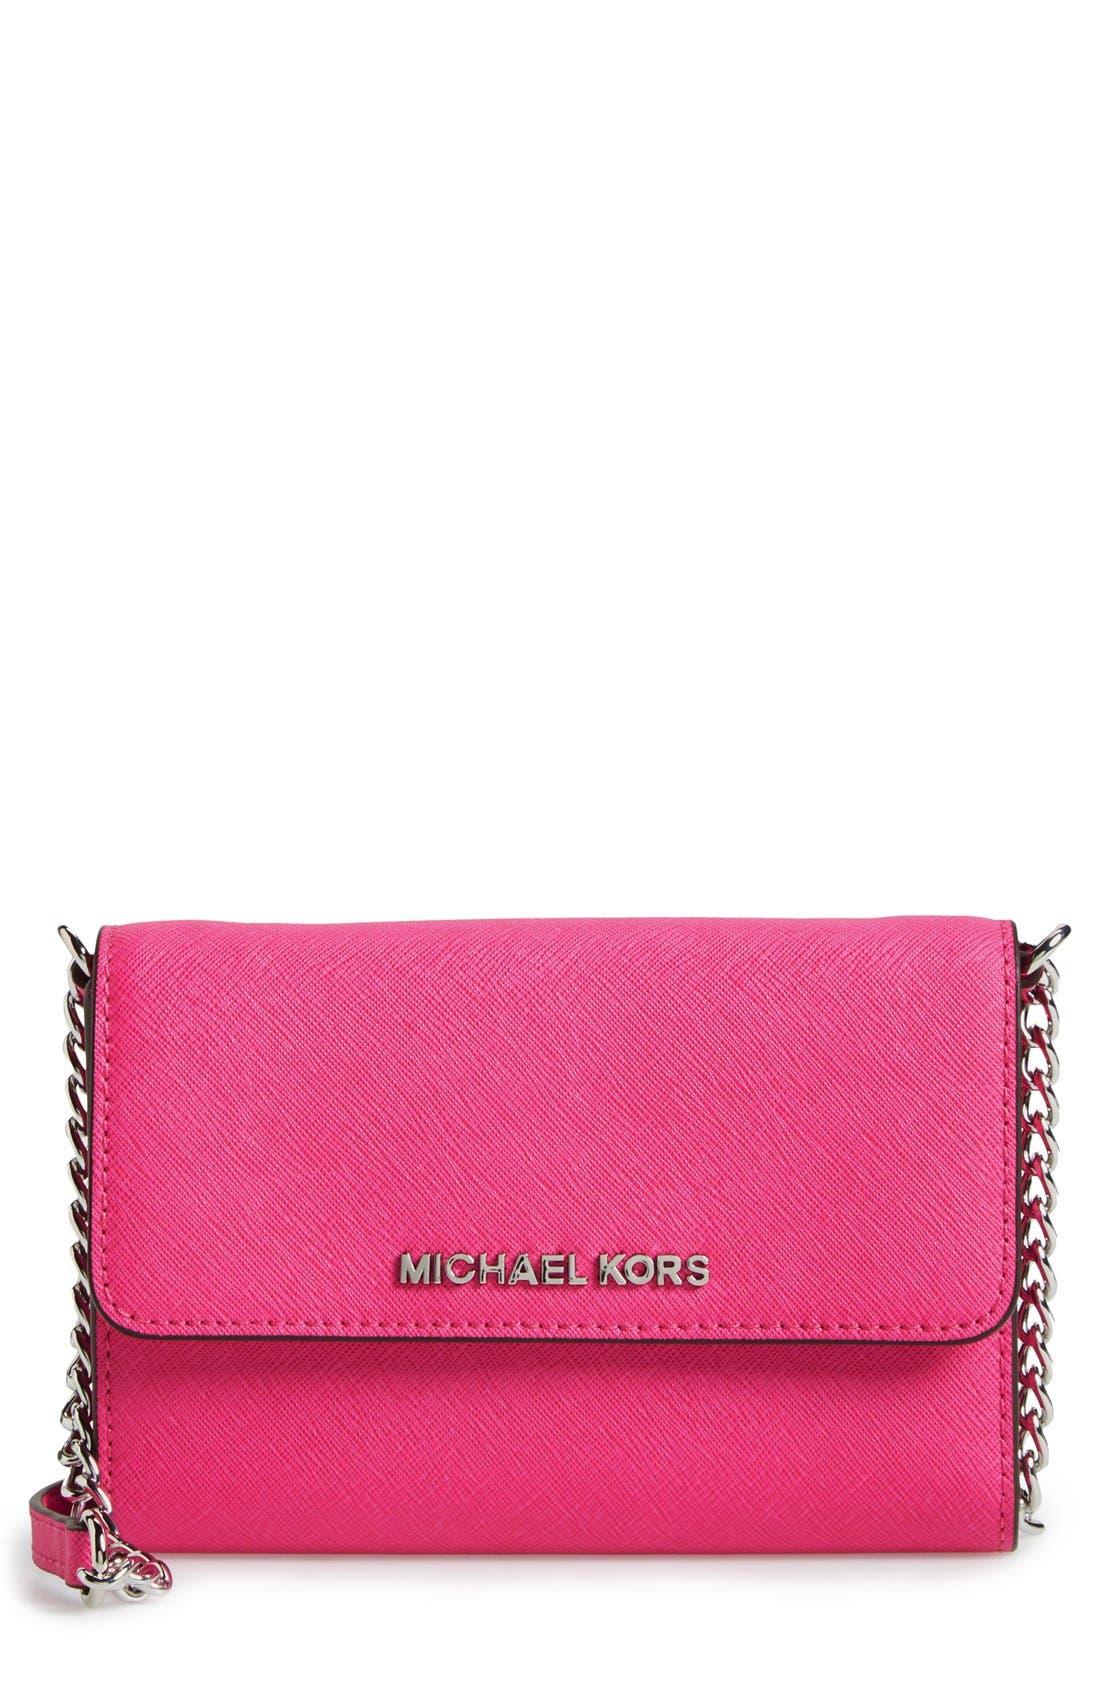 Main Image - MICHAEL Michael Kors 'Large Jet Set' Saffiano Leather Crossbody Bag